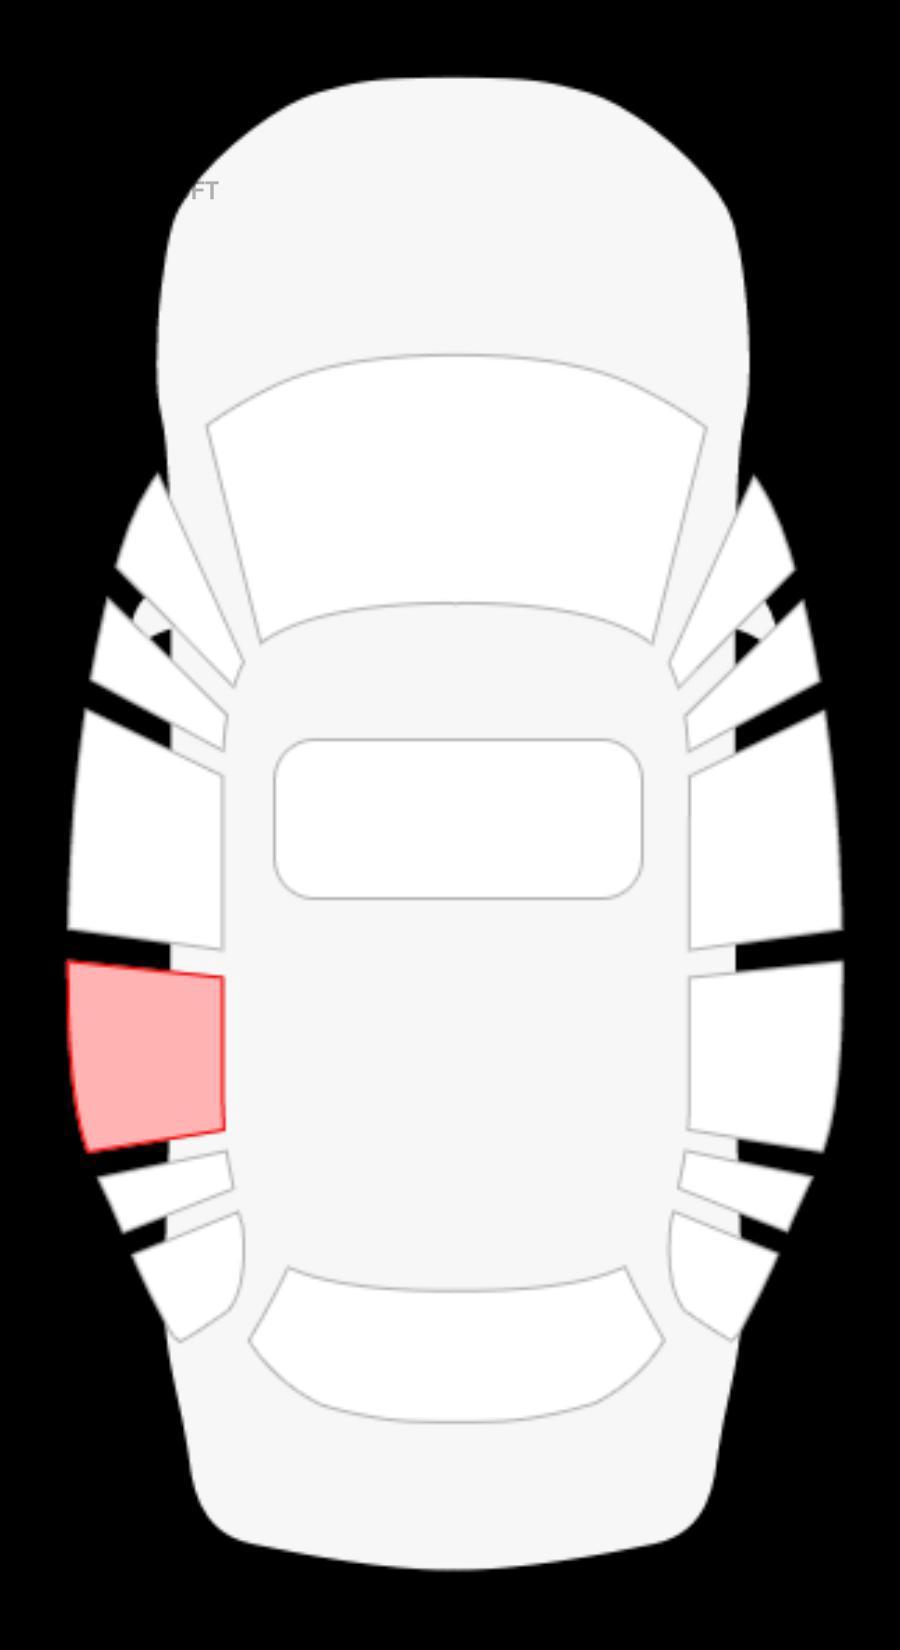 Fiat Ducato (Елабуга) боковое заднее левое рамка раздвижная в сборе (короткая база) ТЗ